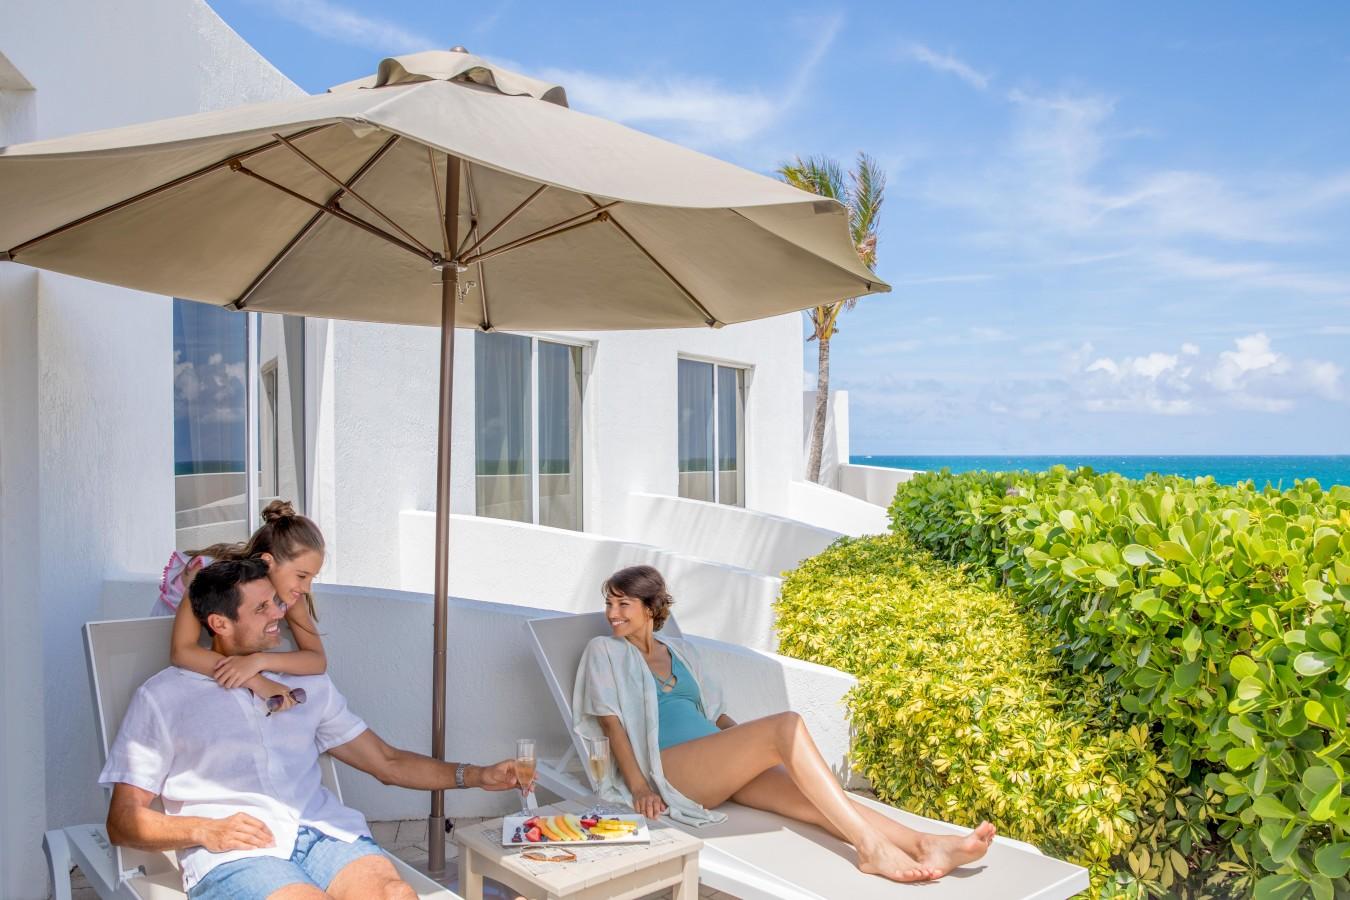 Cabanas at Trump International Beach Resort